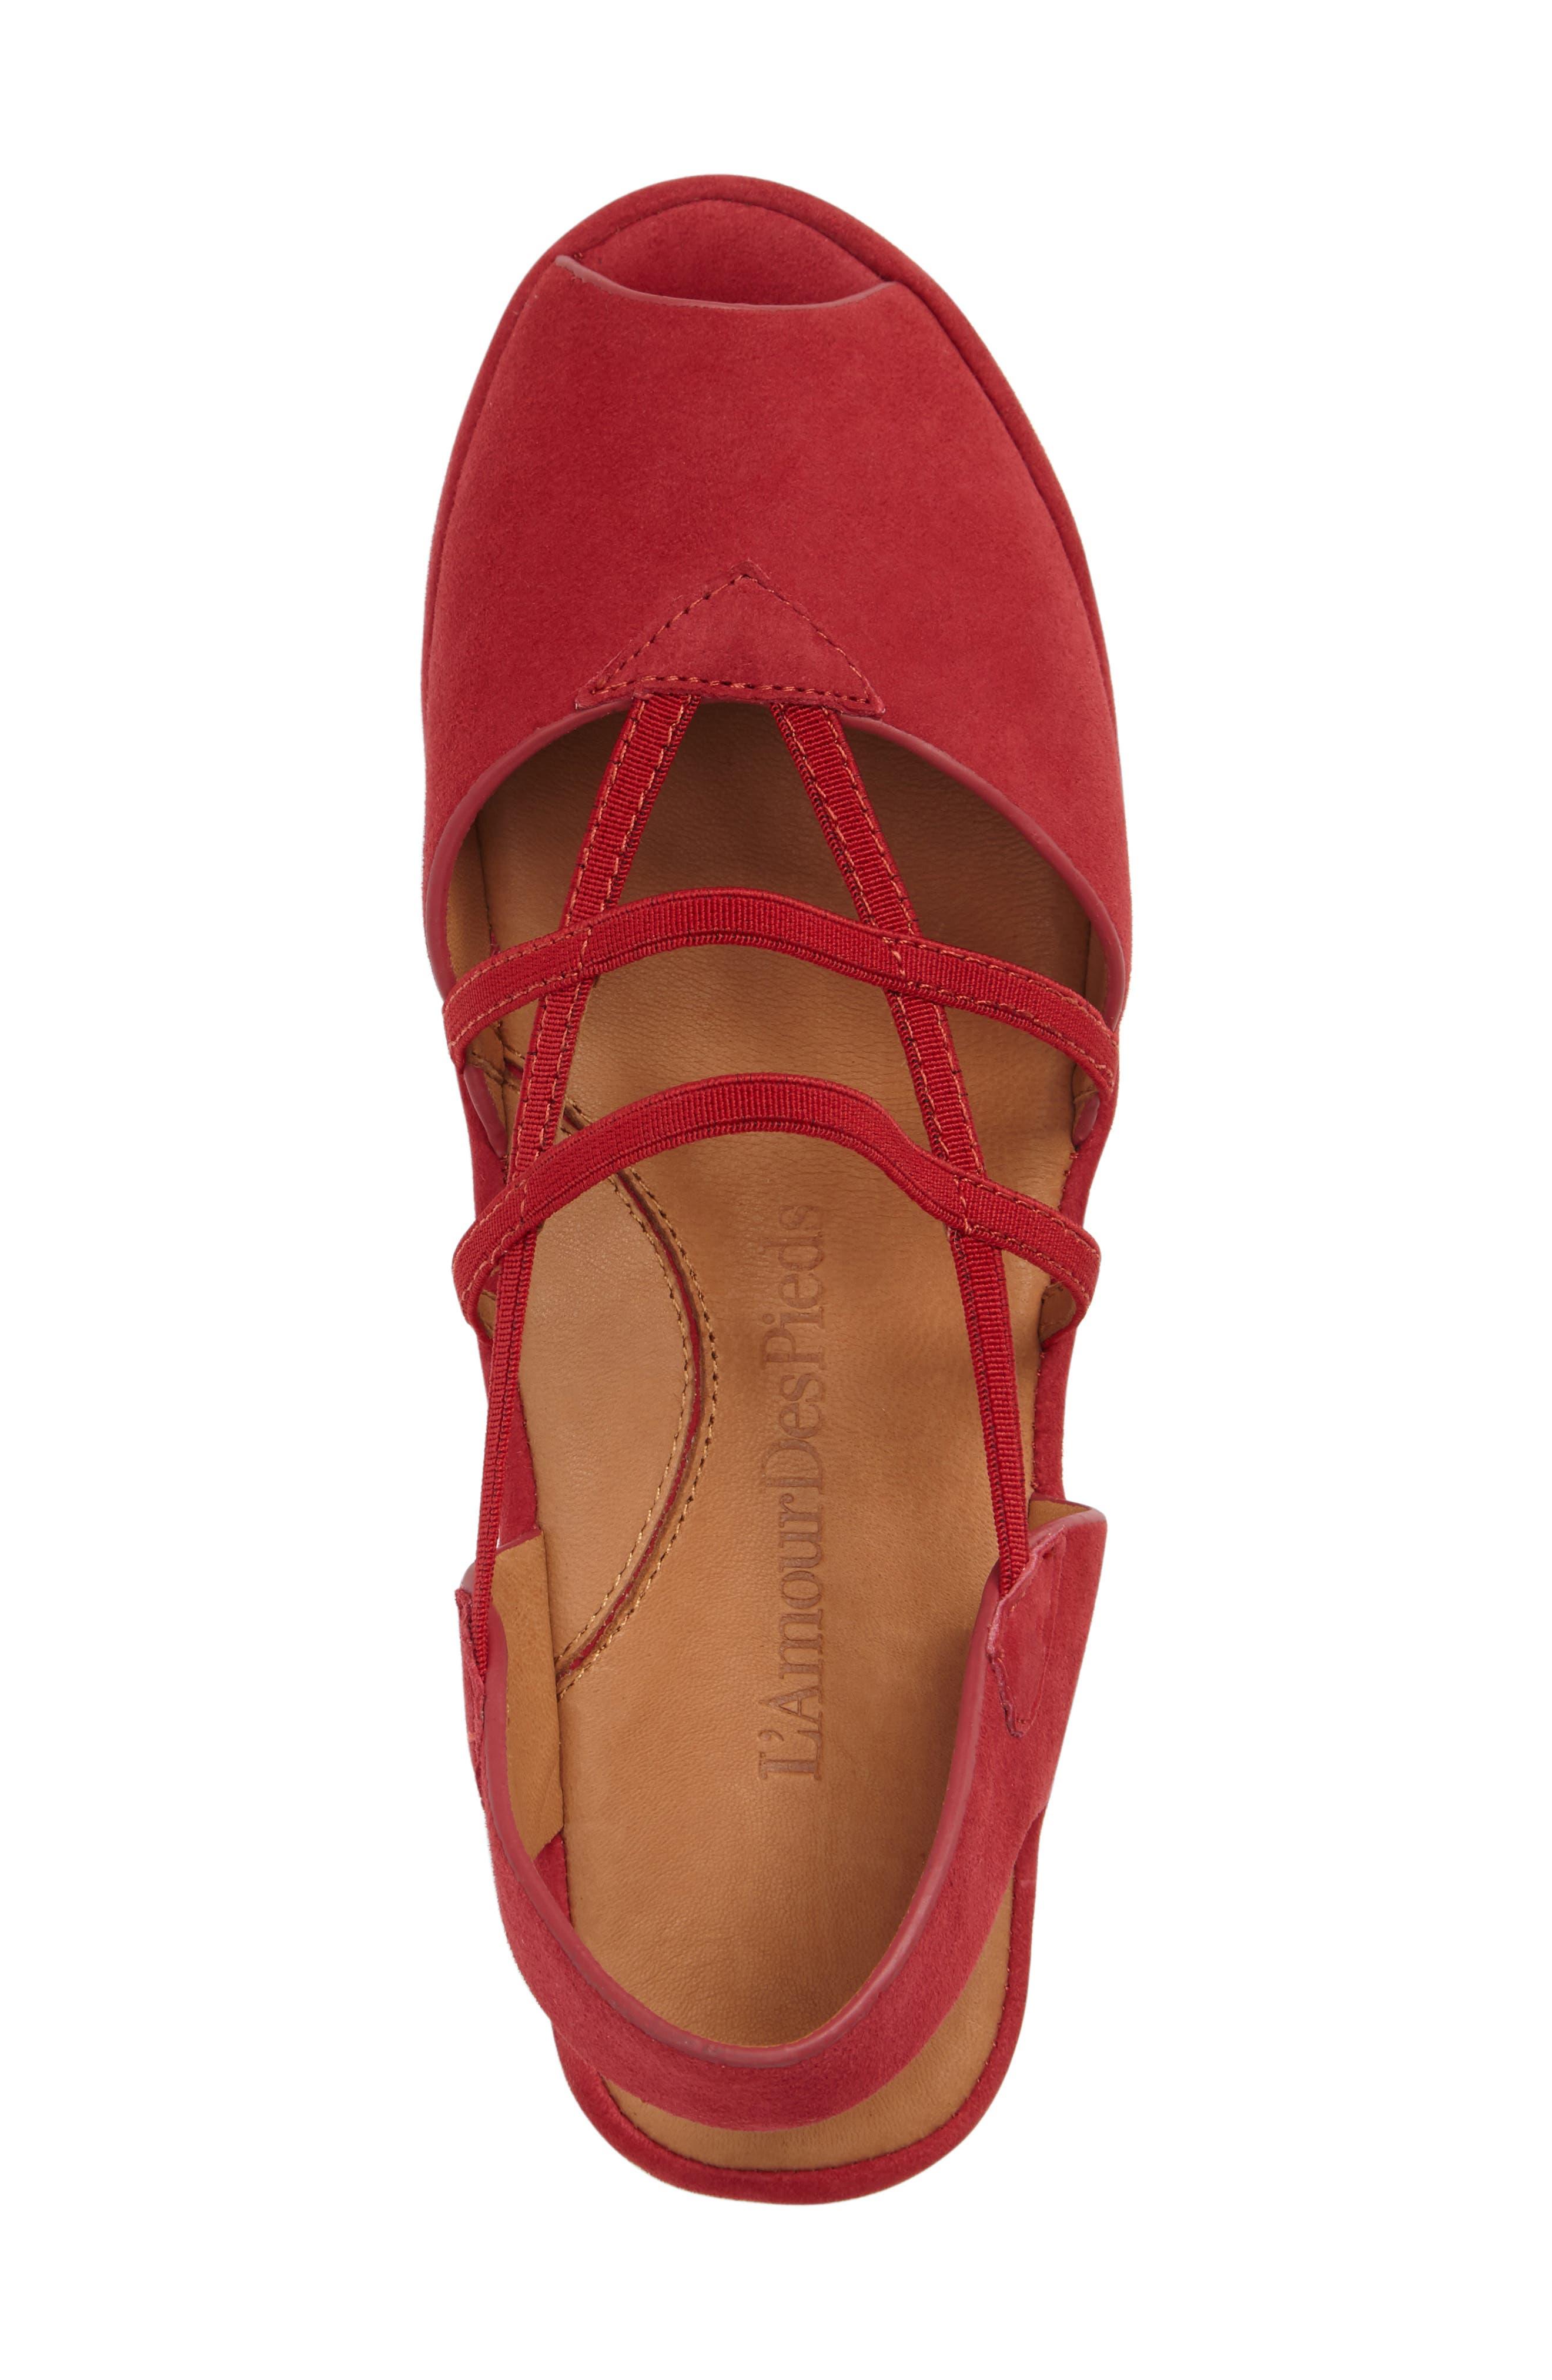 Adelais Platform Wedge Sandal,                             Alternate thumbnail 3, color,                             Red Nubuck Leather